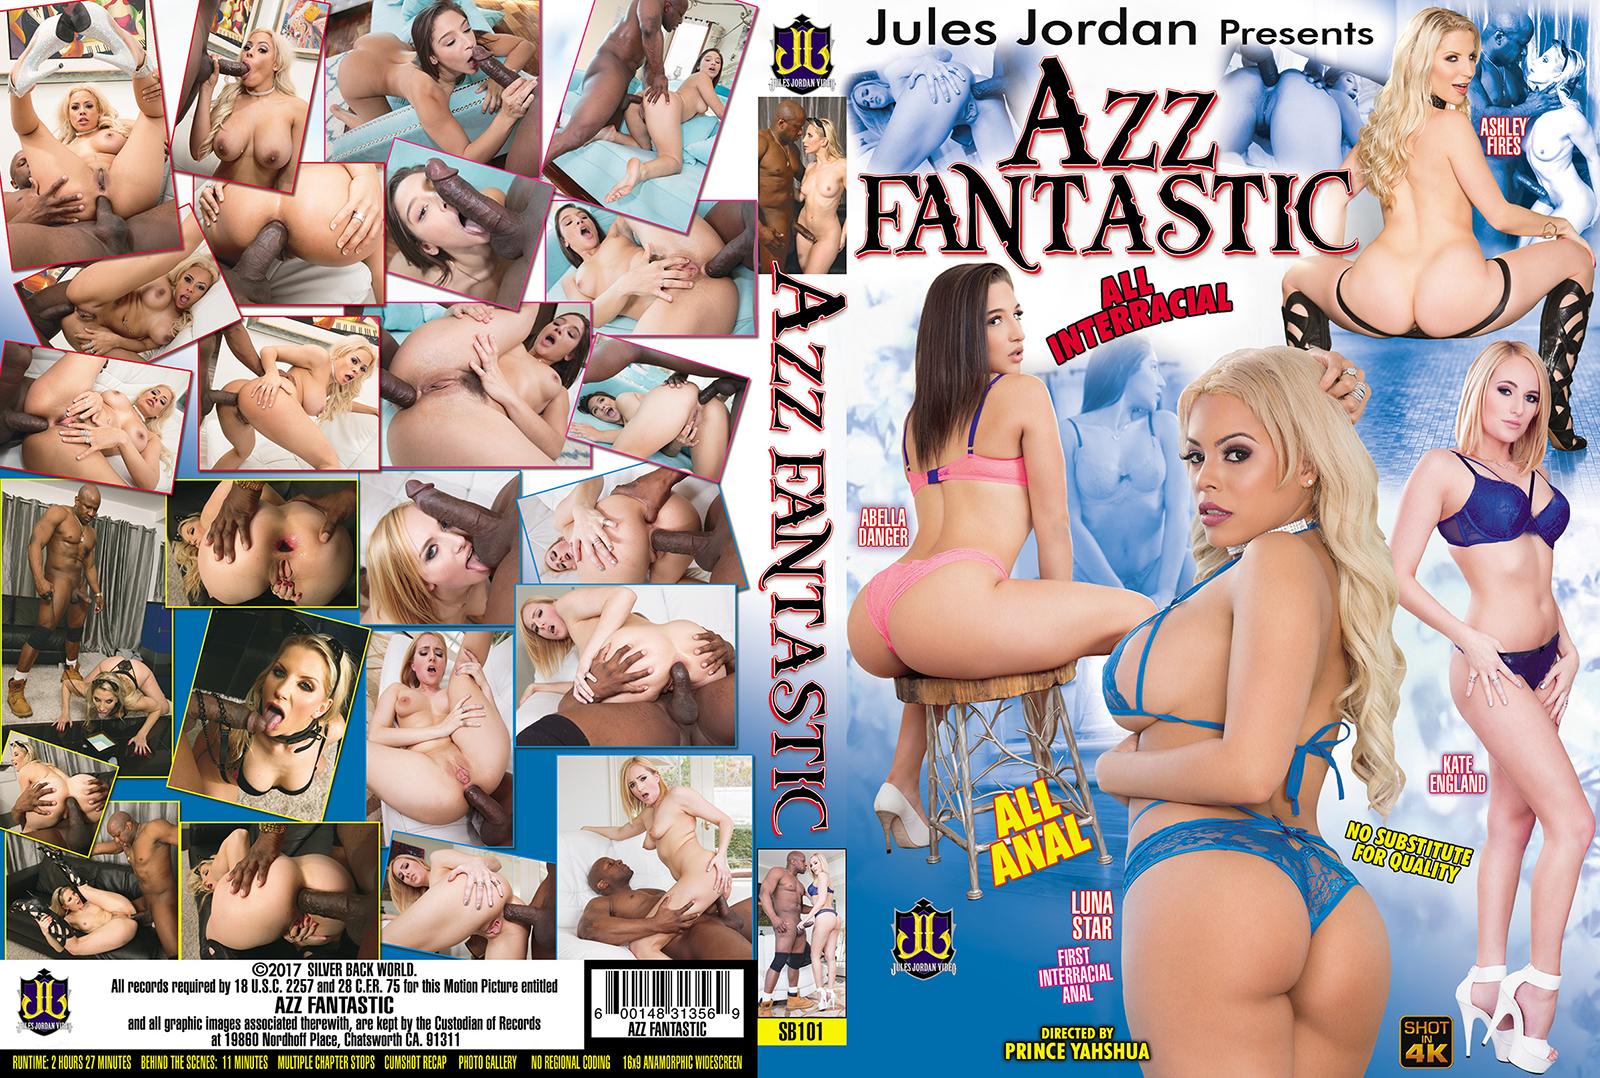 Azz Fantastic DVD